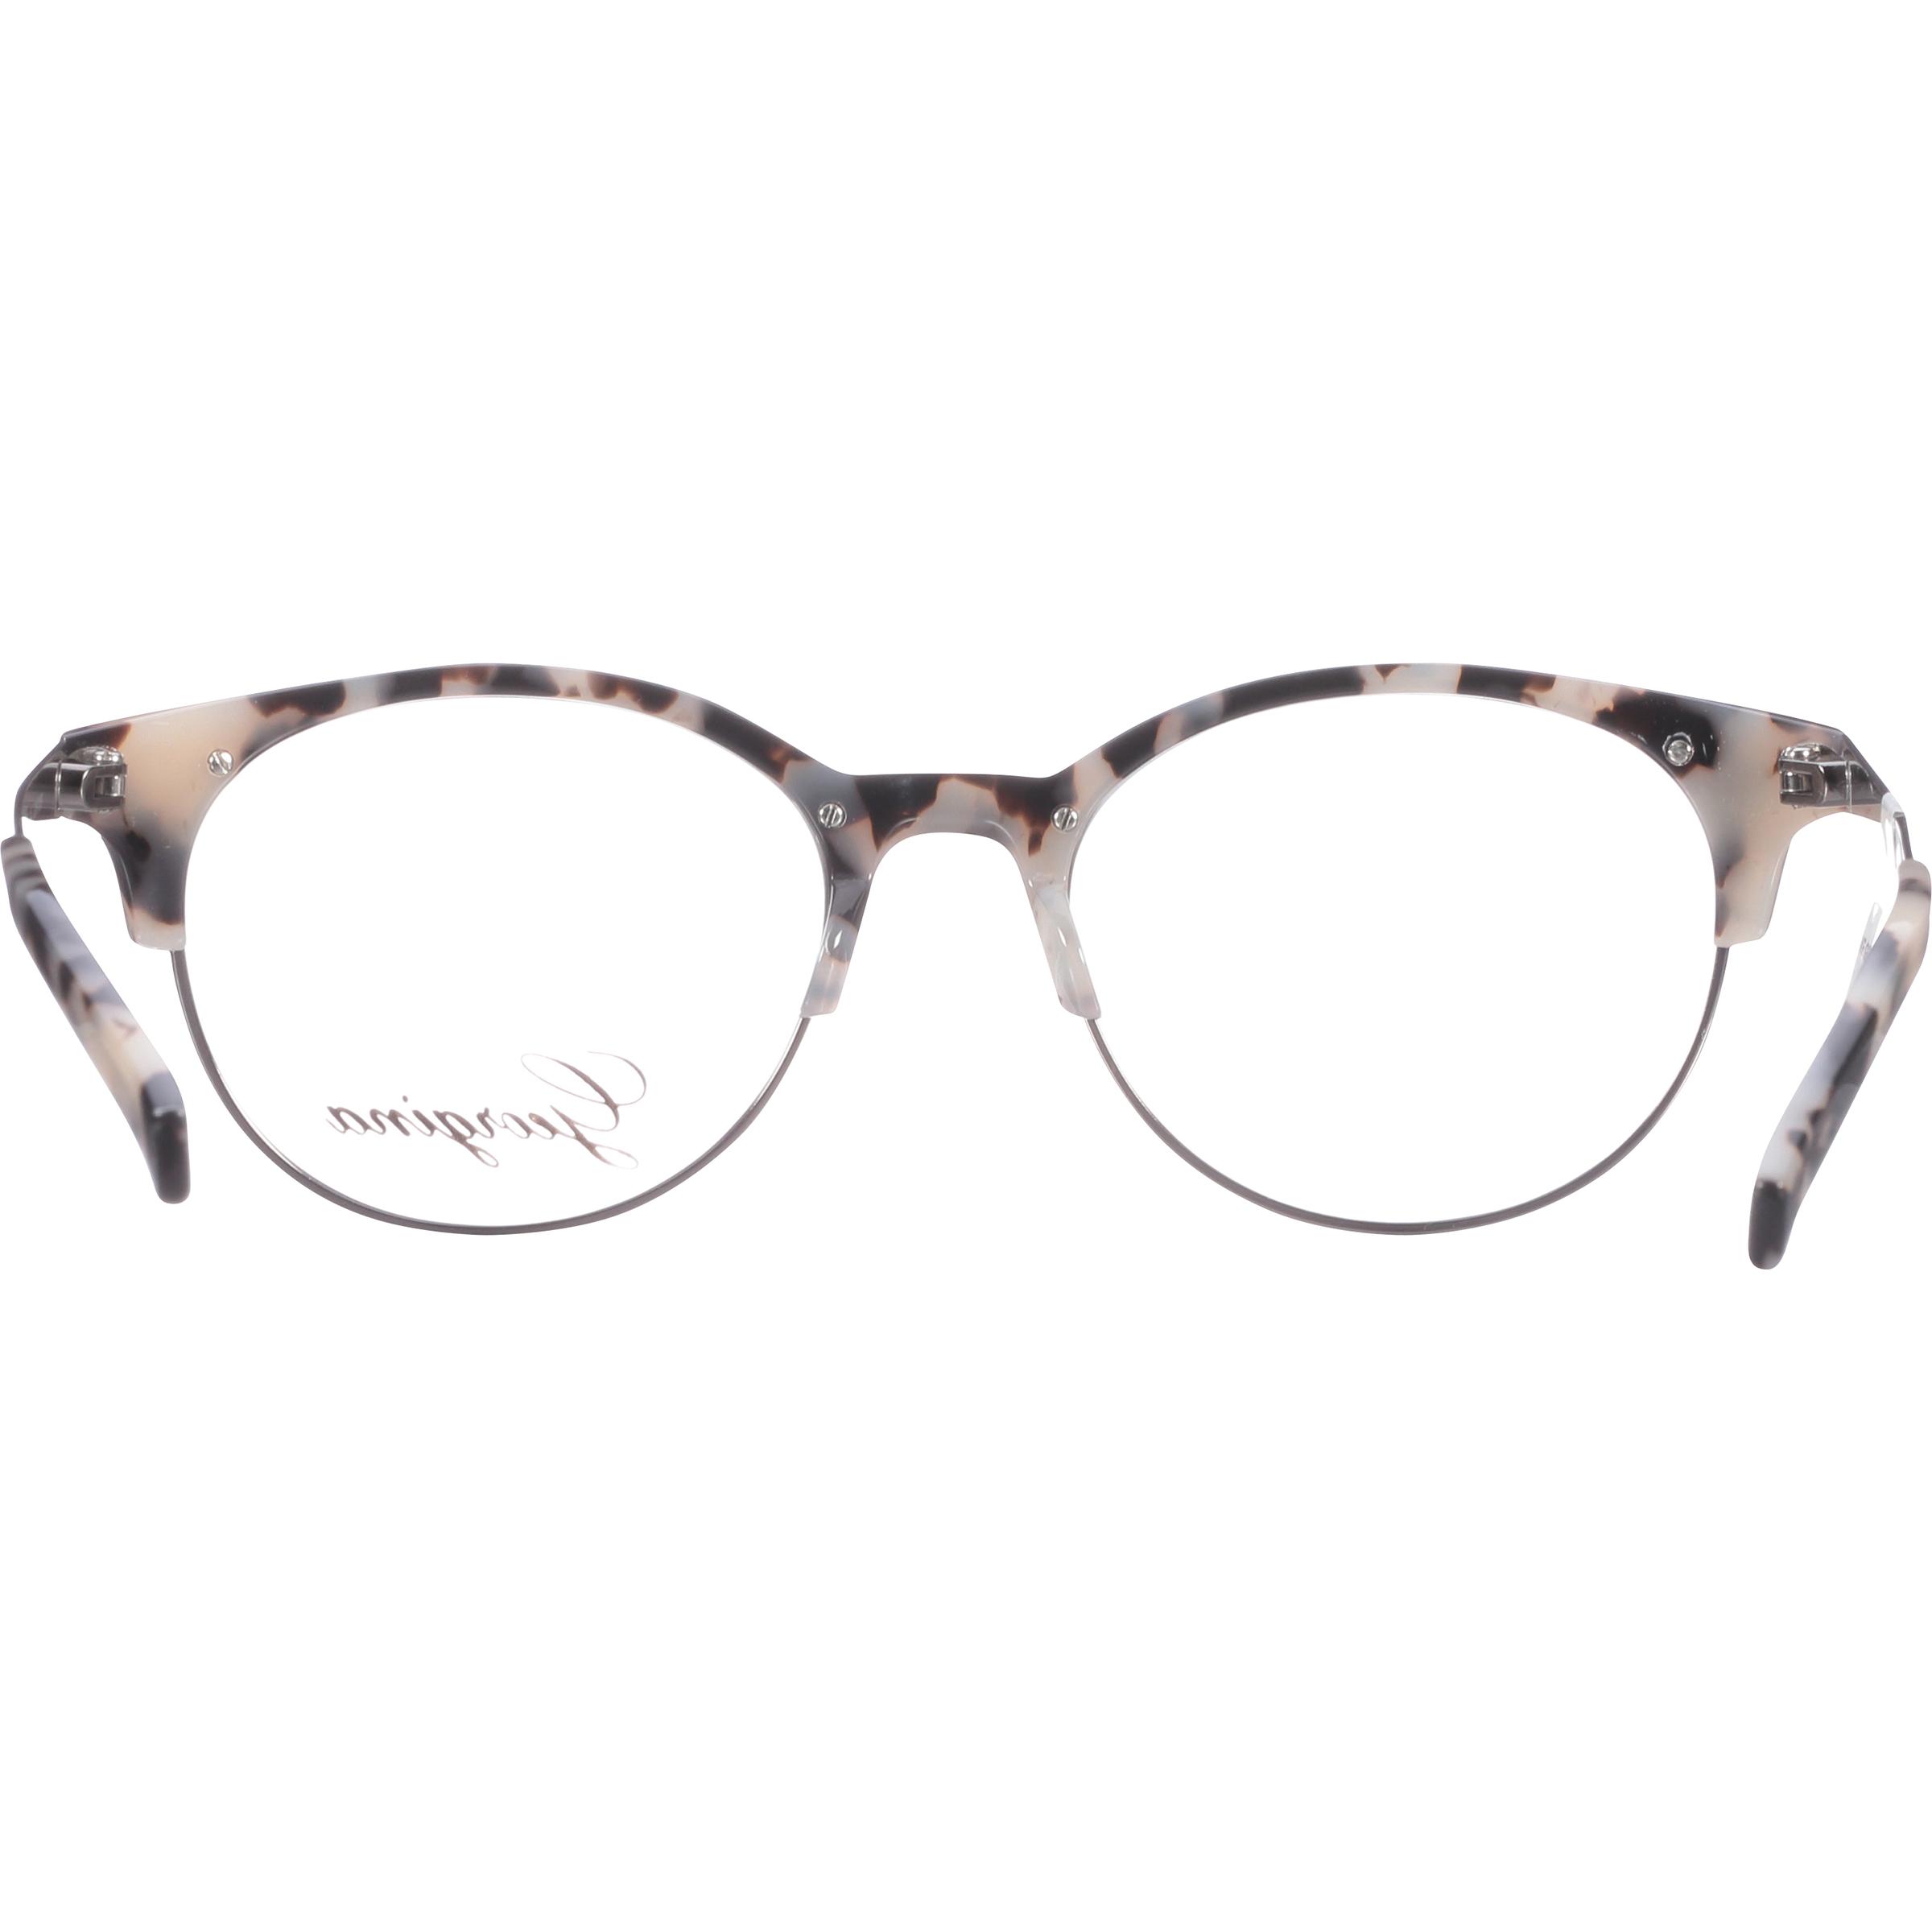 Fantastic Comic Book Glasses Frames Gallery - Framed Art Ideas ...